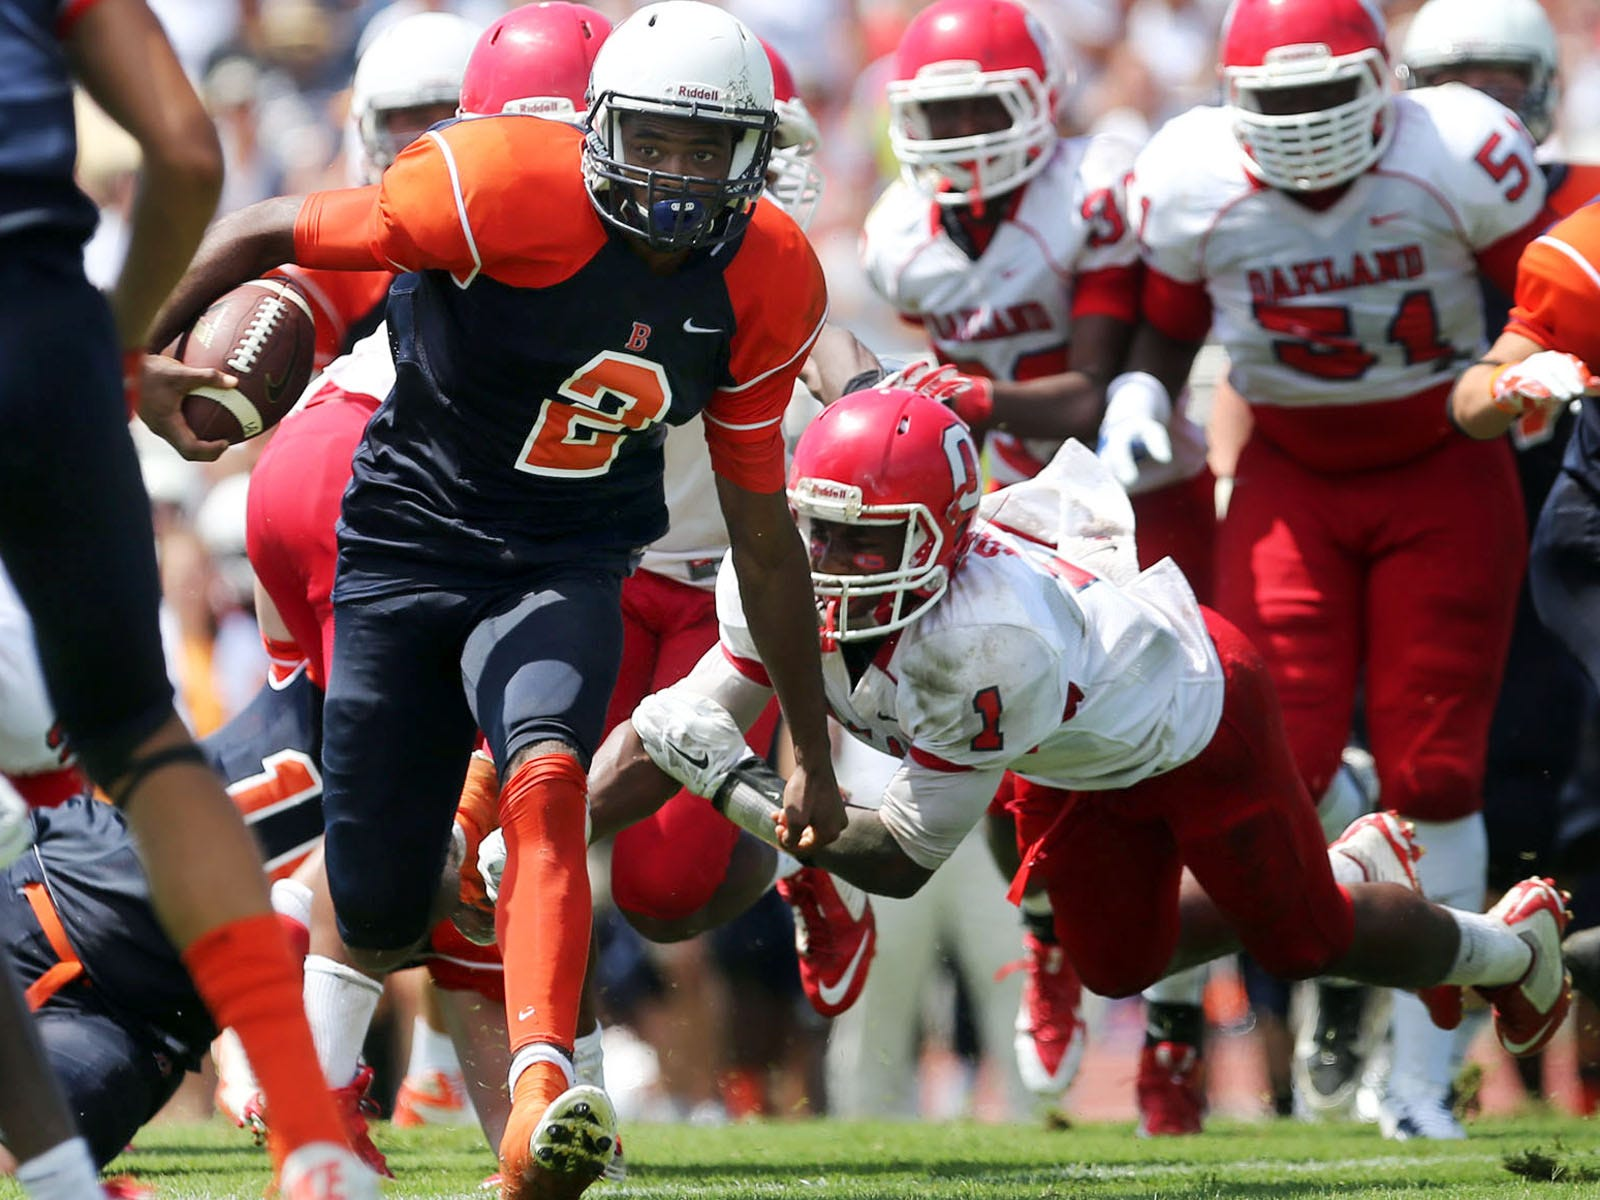 Blackman quarterback Jauan Jennings rushes against Oakland Sunday, August 24, 2014 at Blackman.